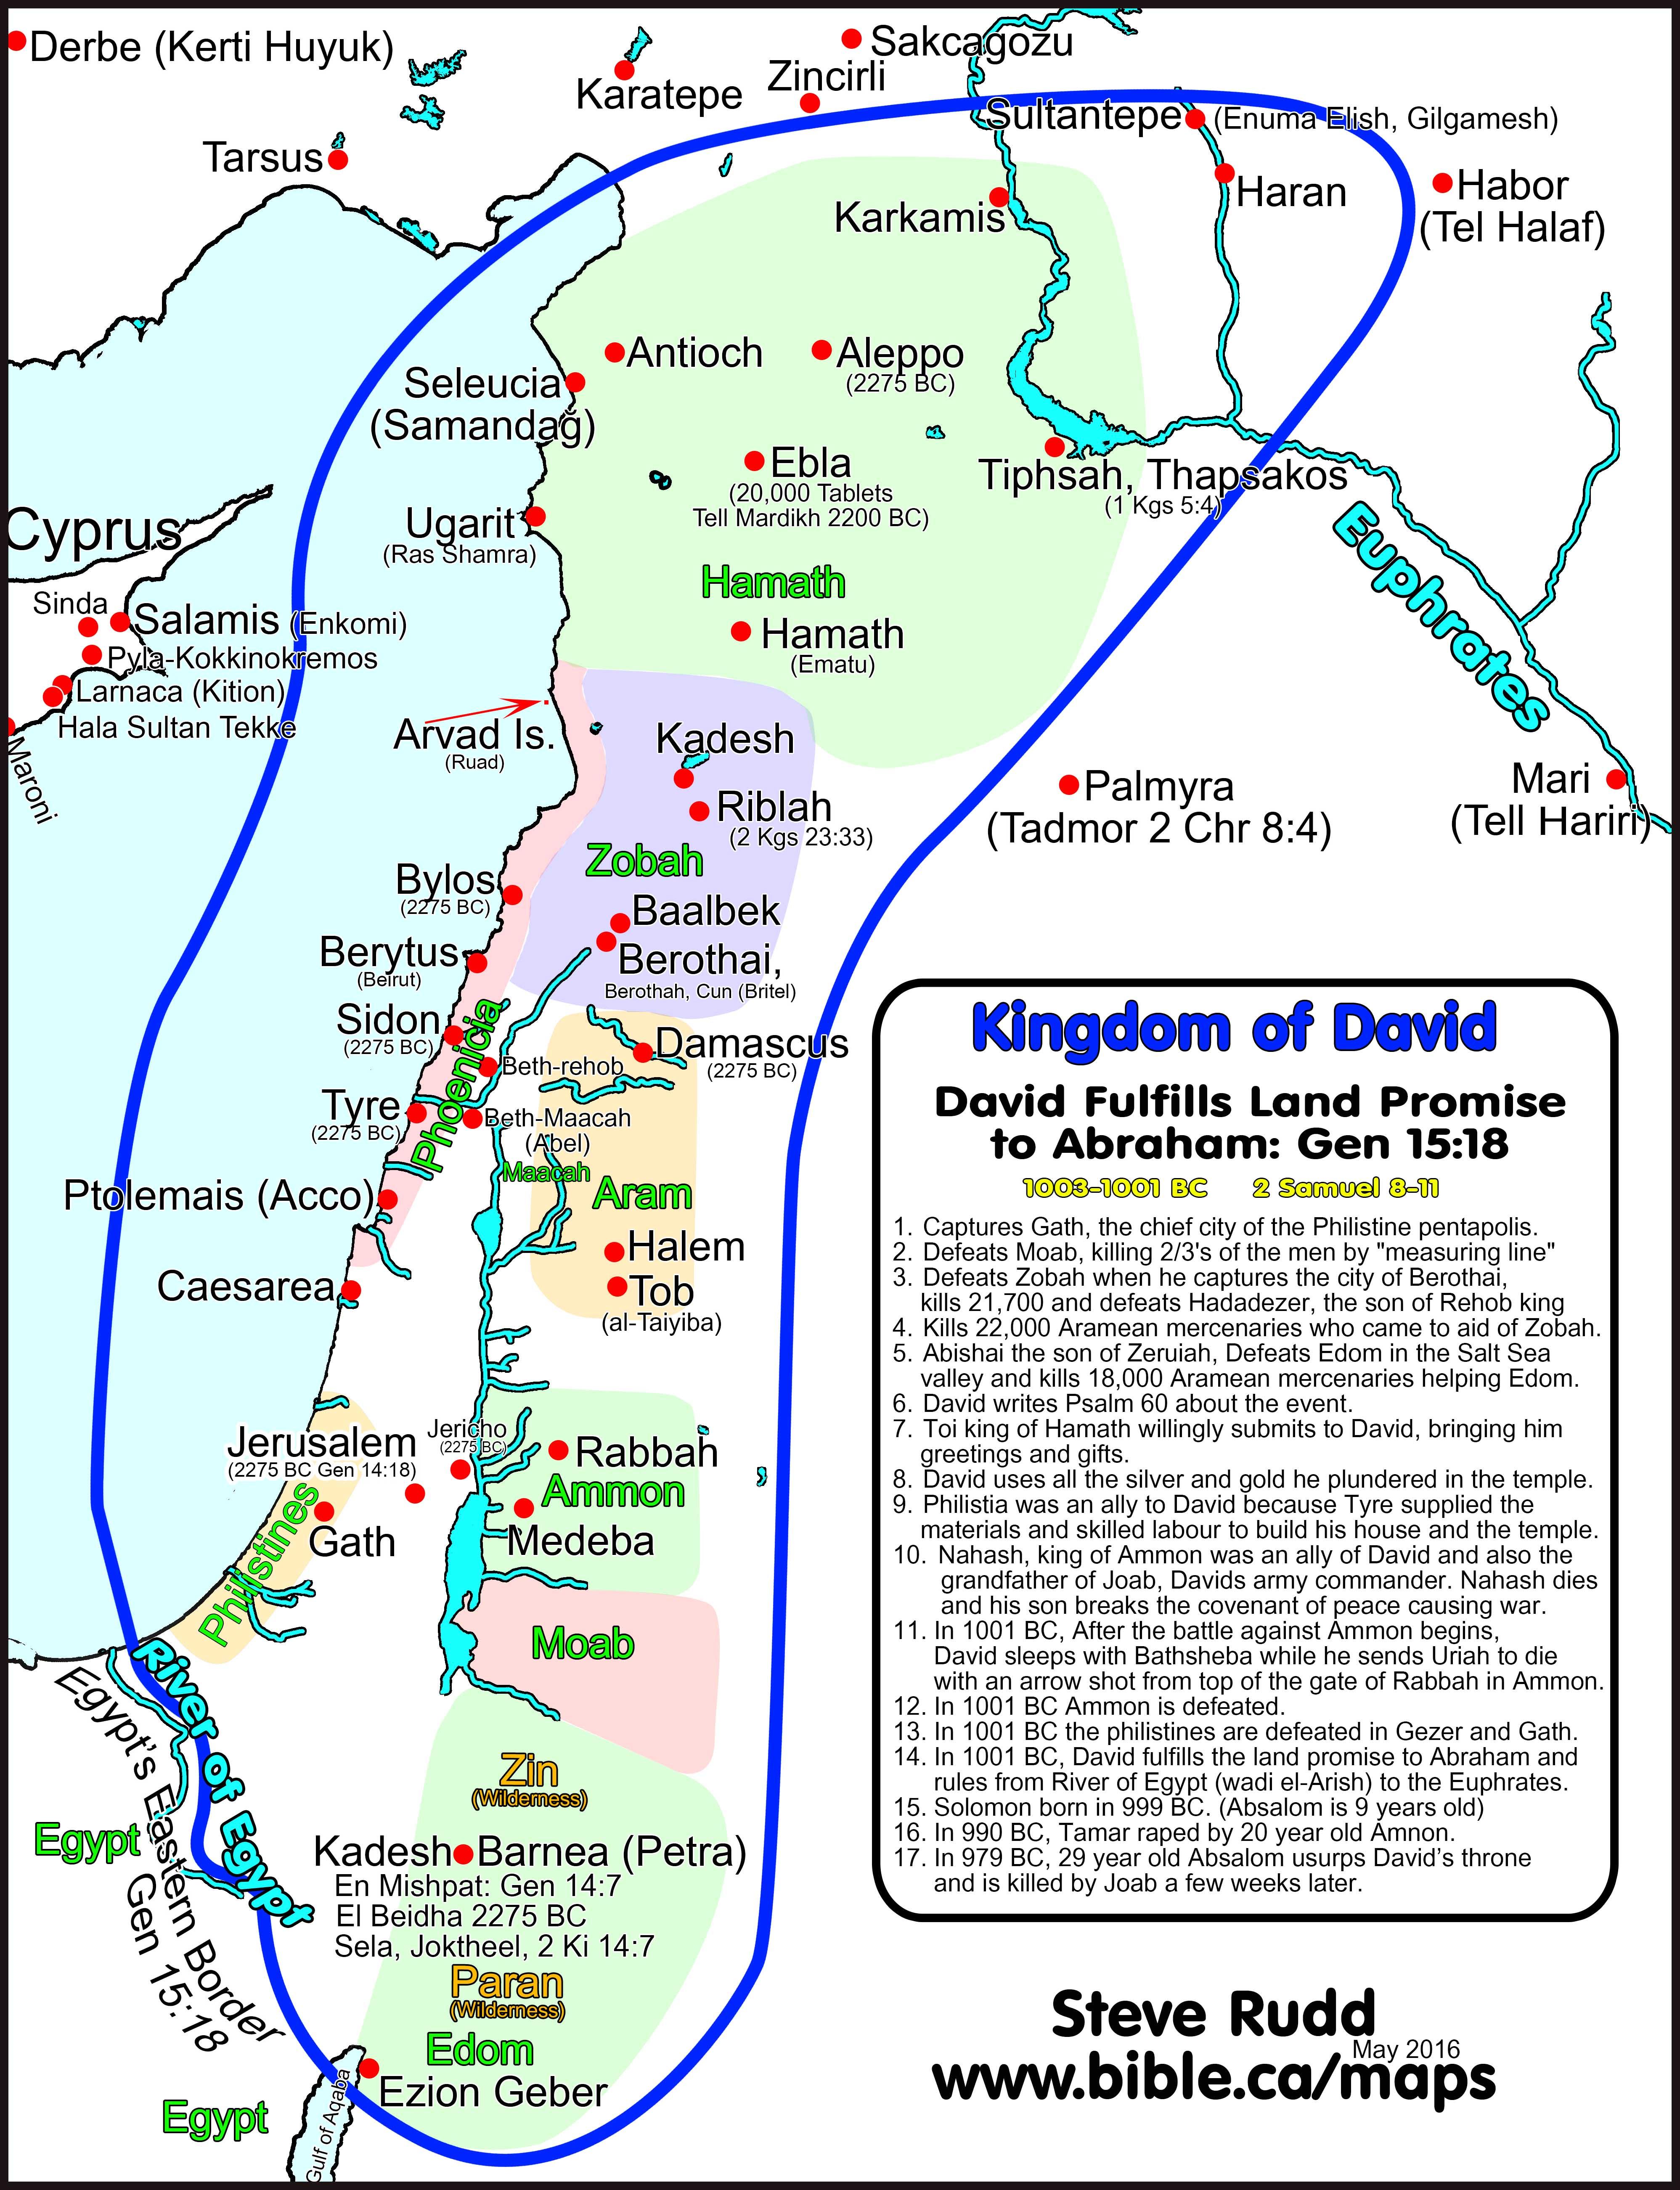 Kingdom Of David Fulfills Abraham S Land Promise